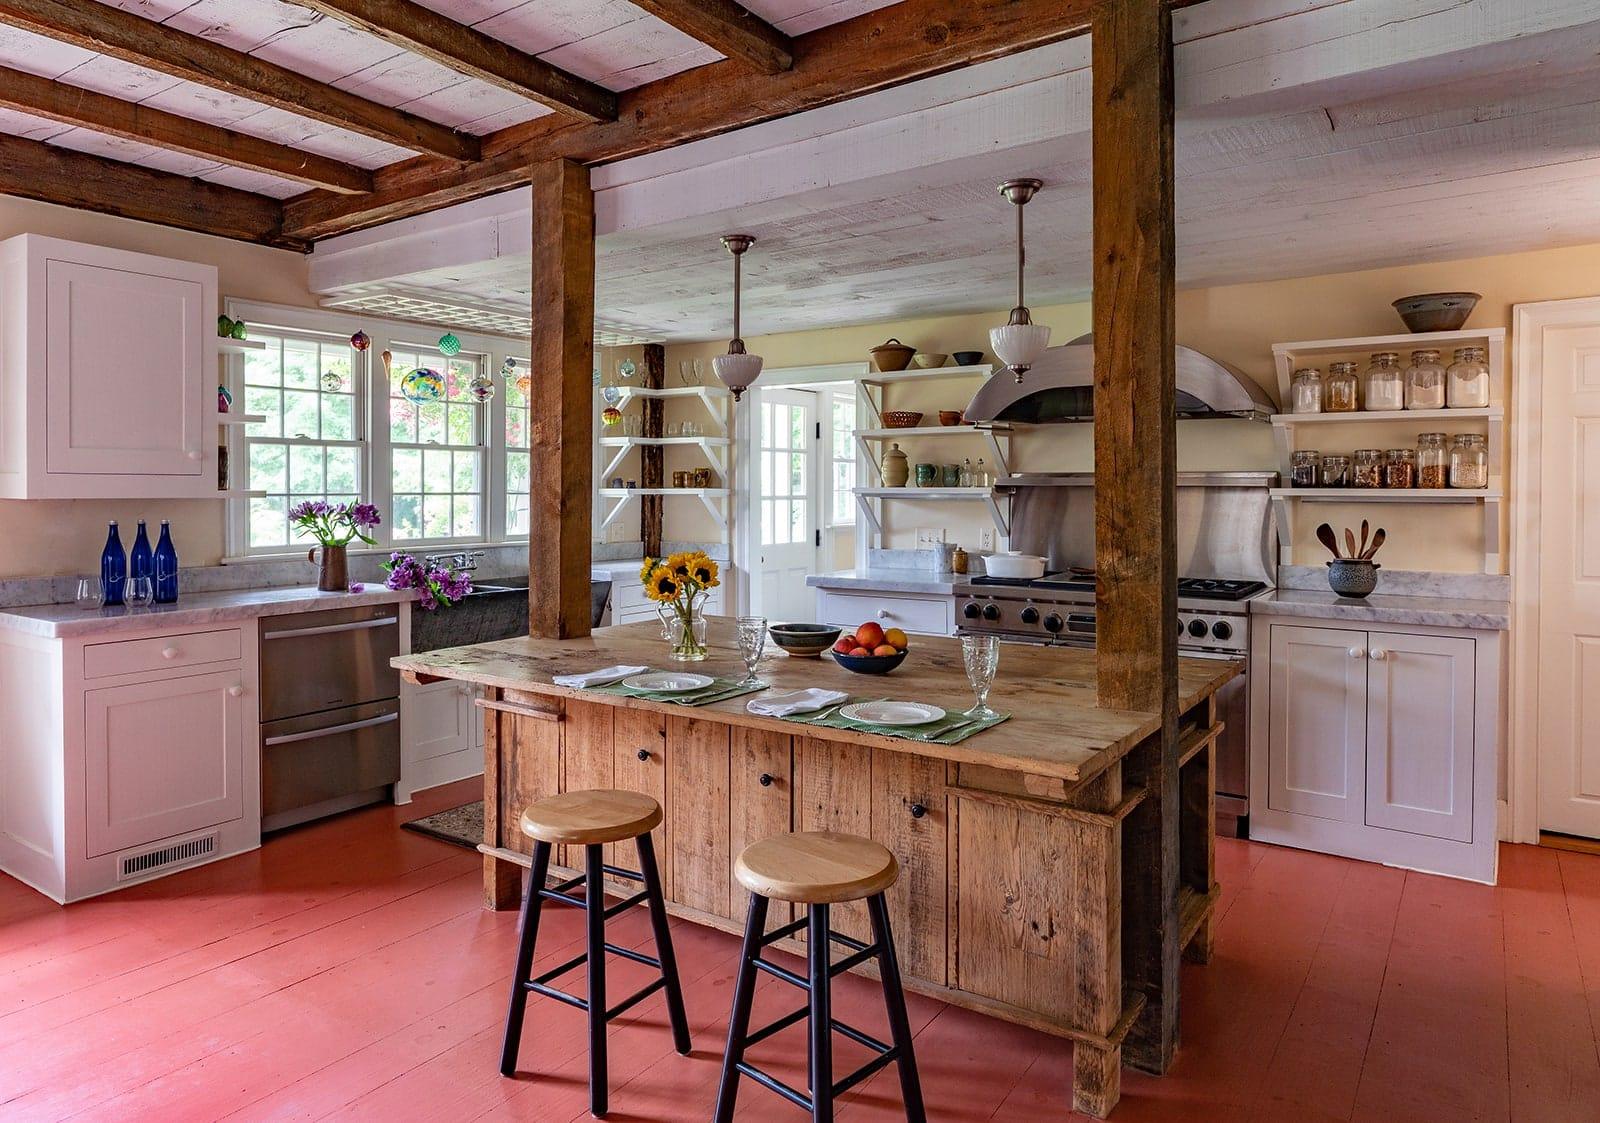 Day Dodge House Ipswich MA Historic Kitchen